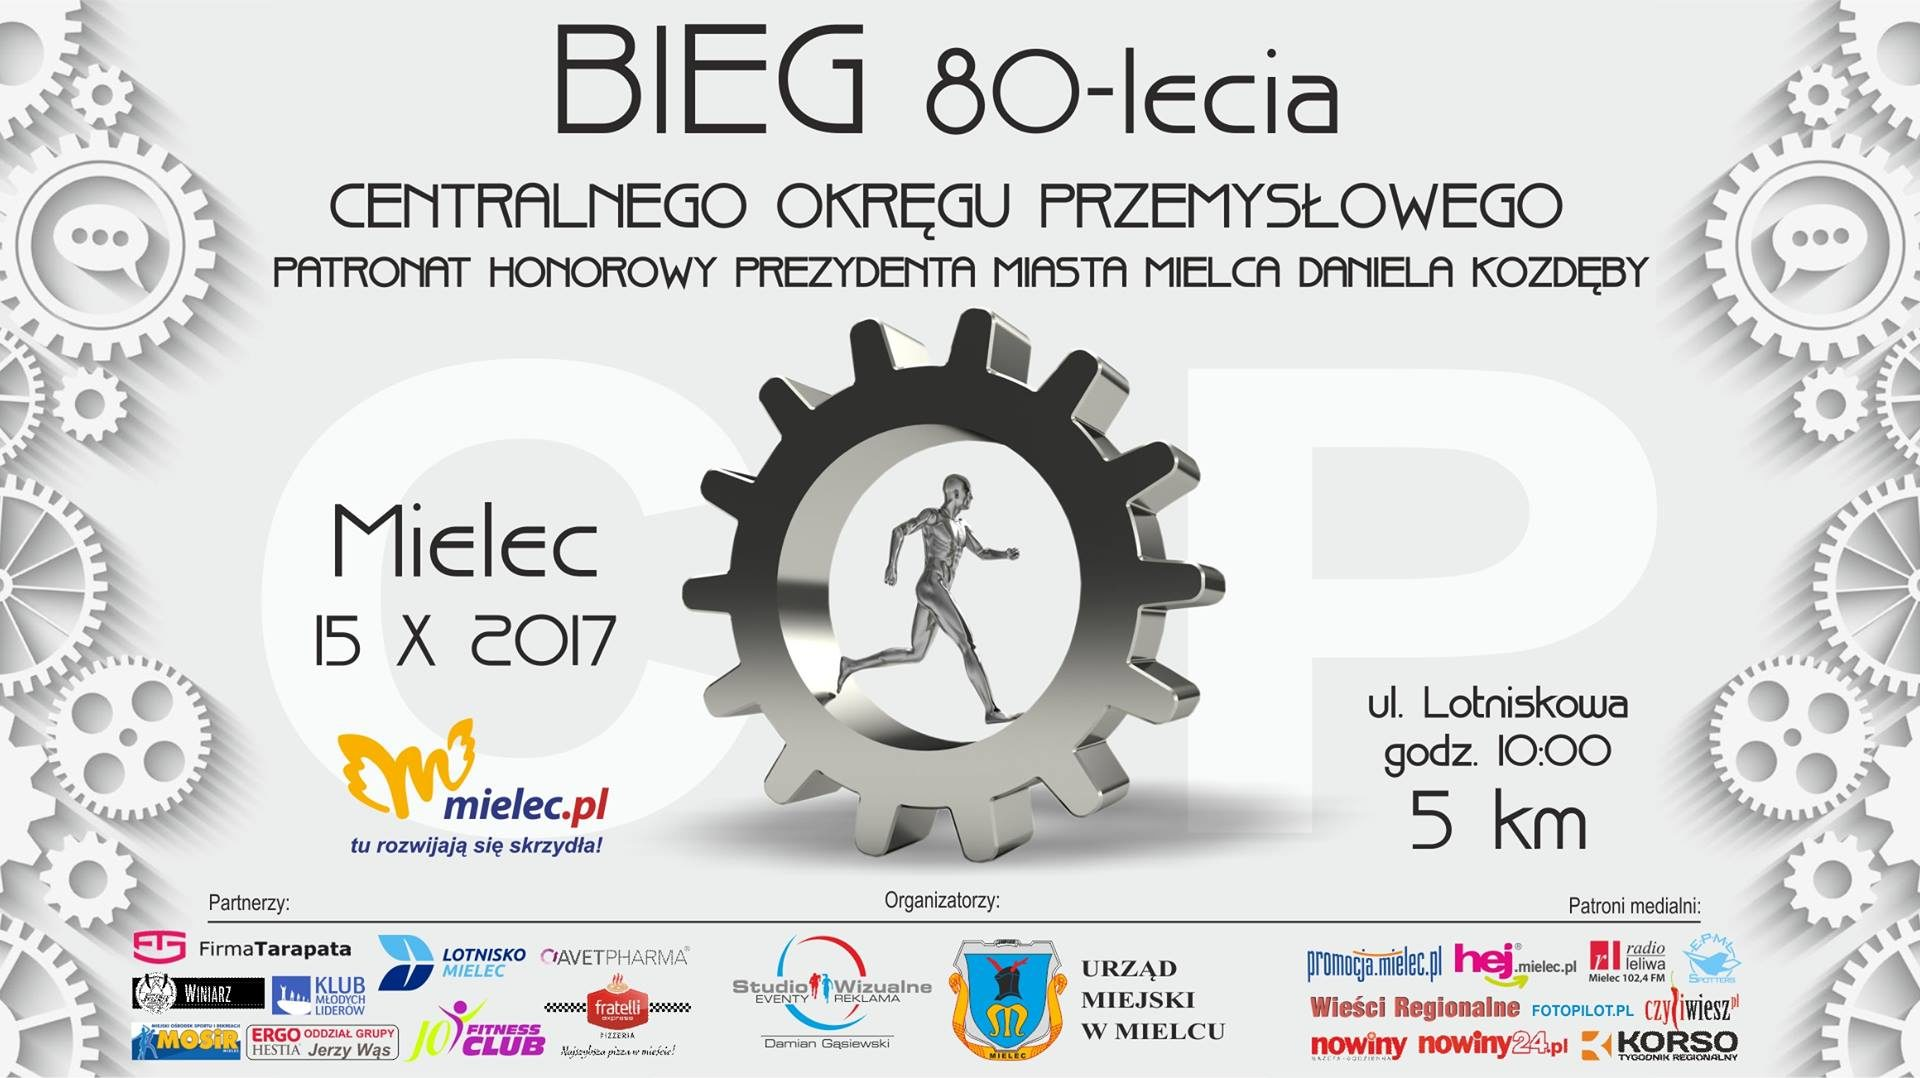 Bieg 80-Lecia COP w Mielcu (okolice lotniska) 15.10.2017